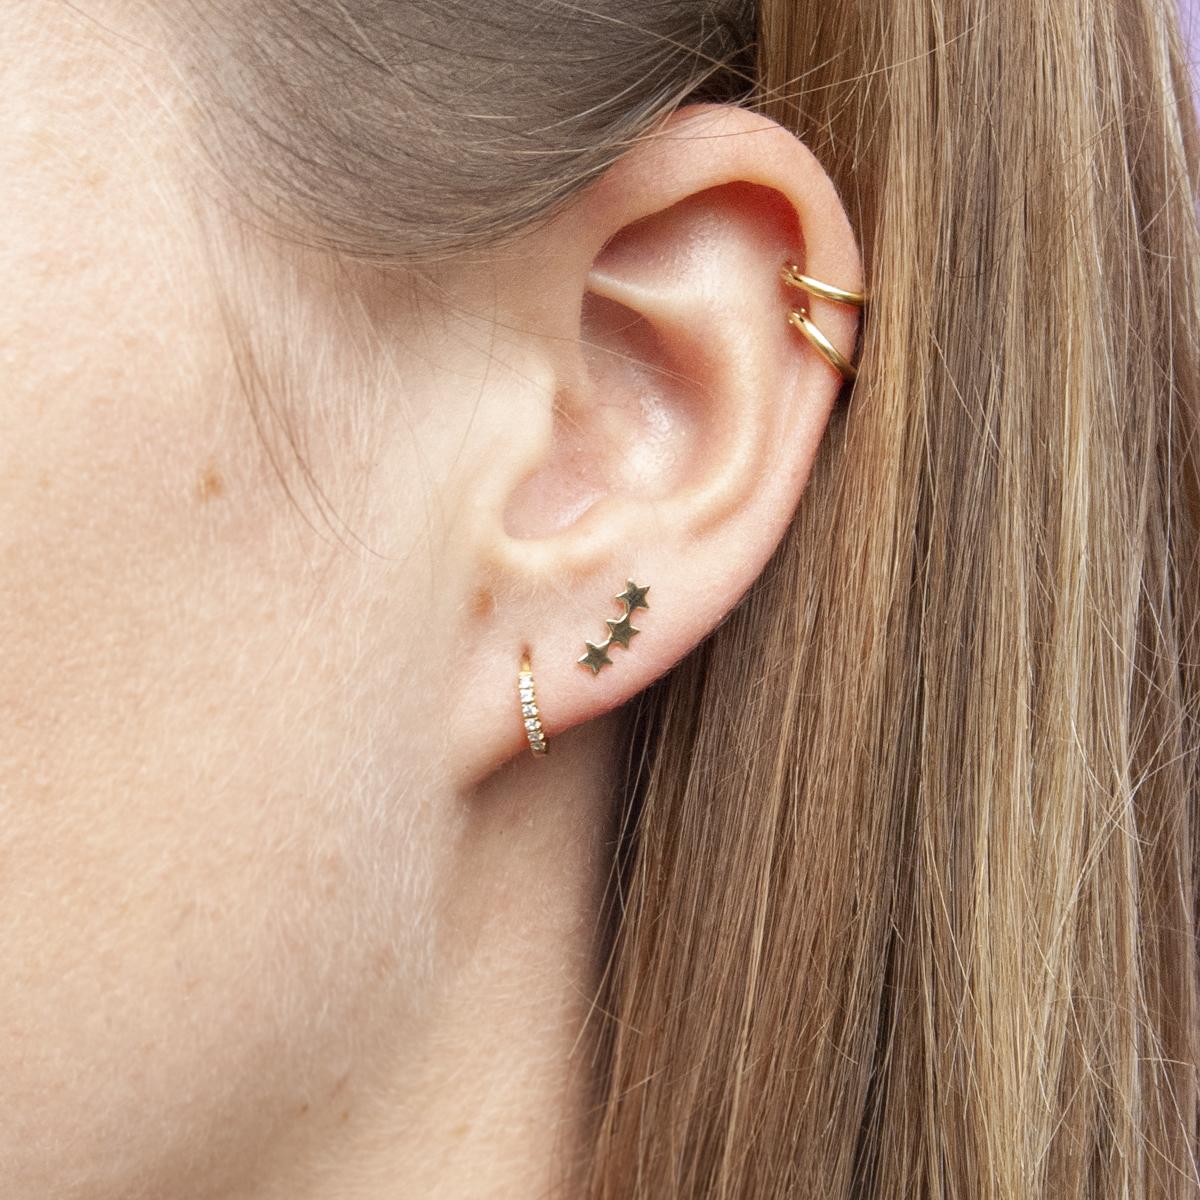 b59ef912e 9ct gold trio of star climber stud earrings — SEOL + GOLD